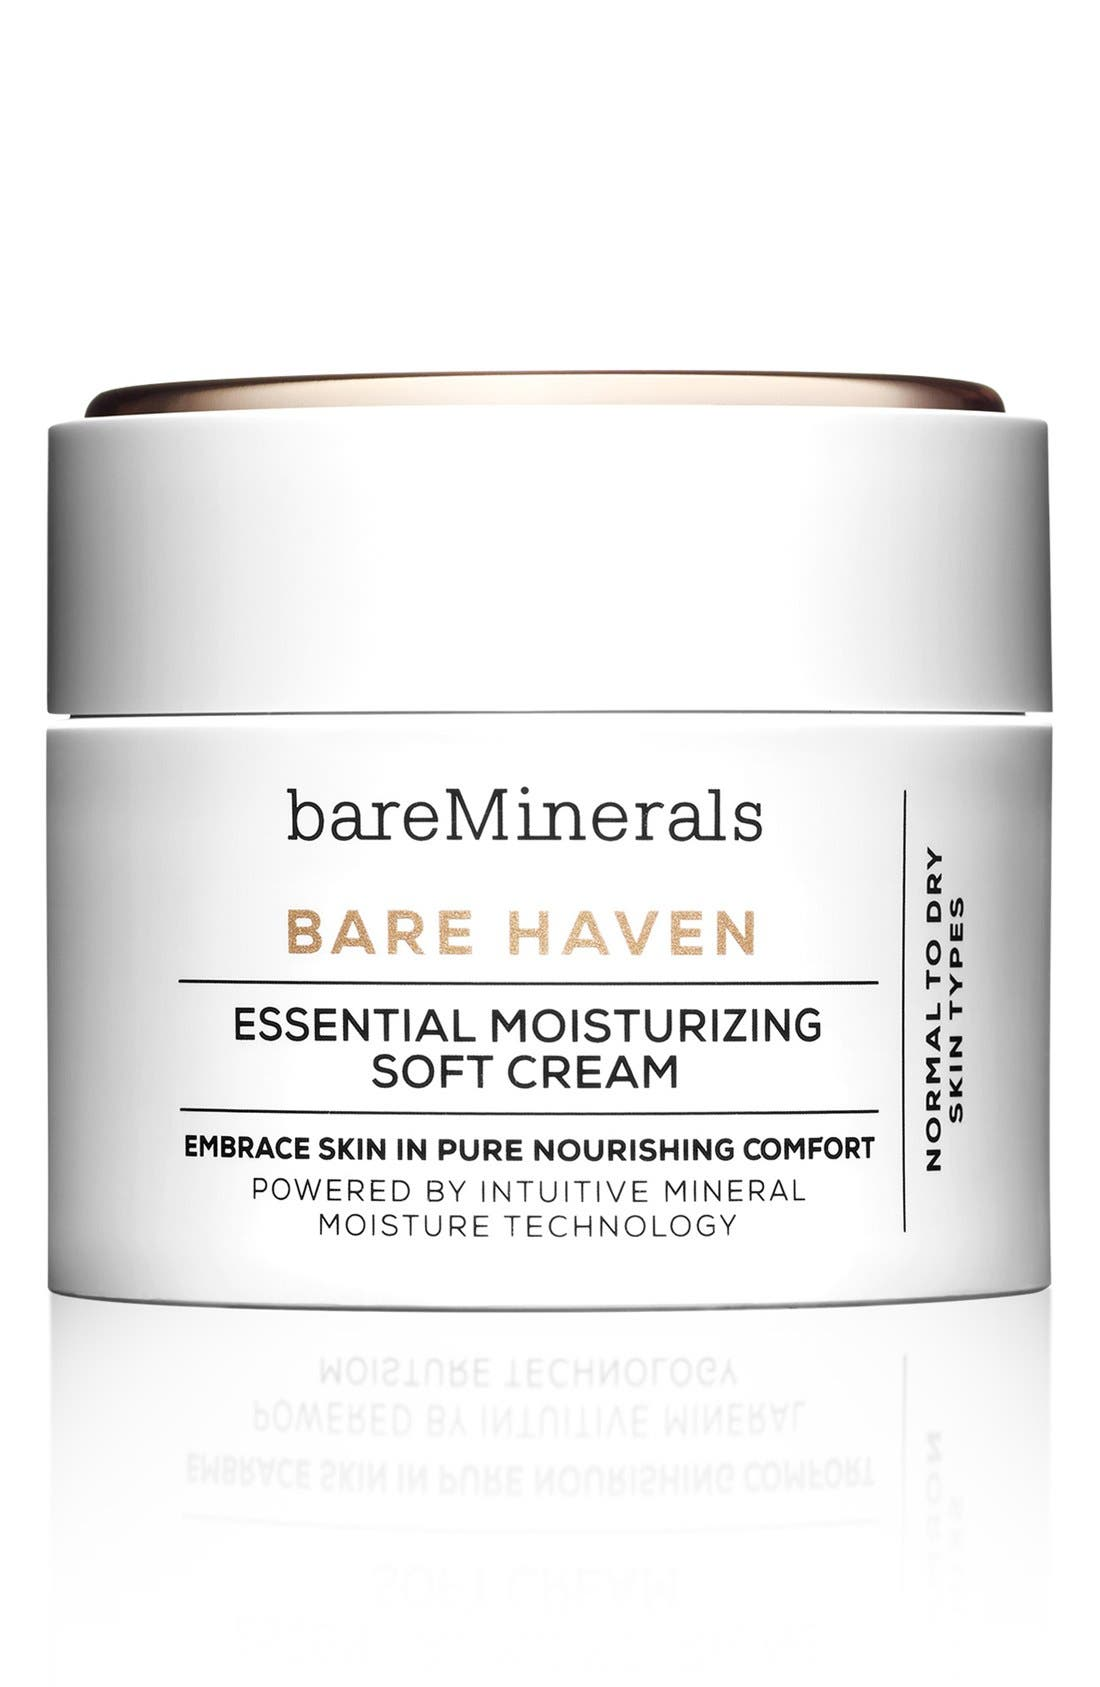 Bare Haven Essential Moisturizing Soft Cream,                             Main thumbnail 1, color,                             NO COLOR